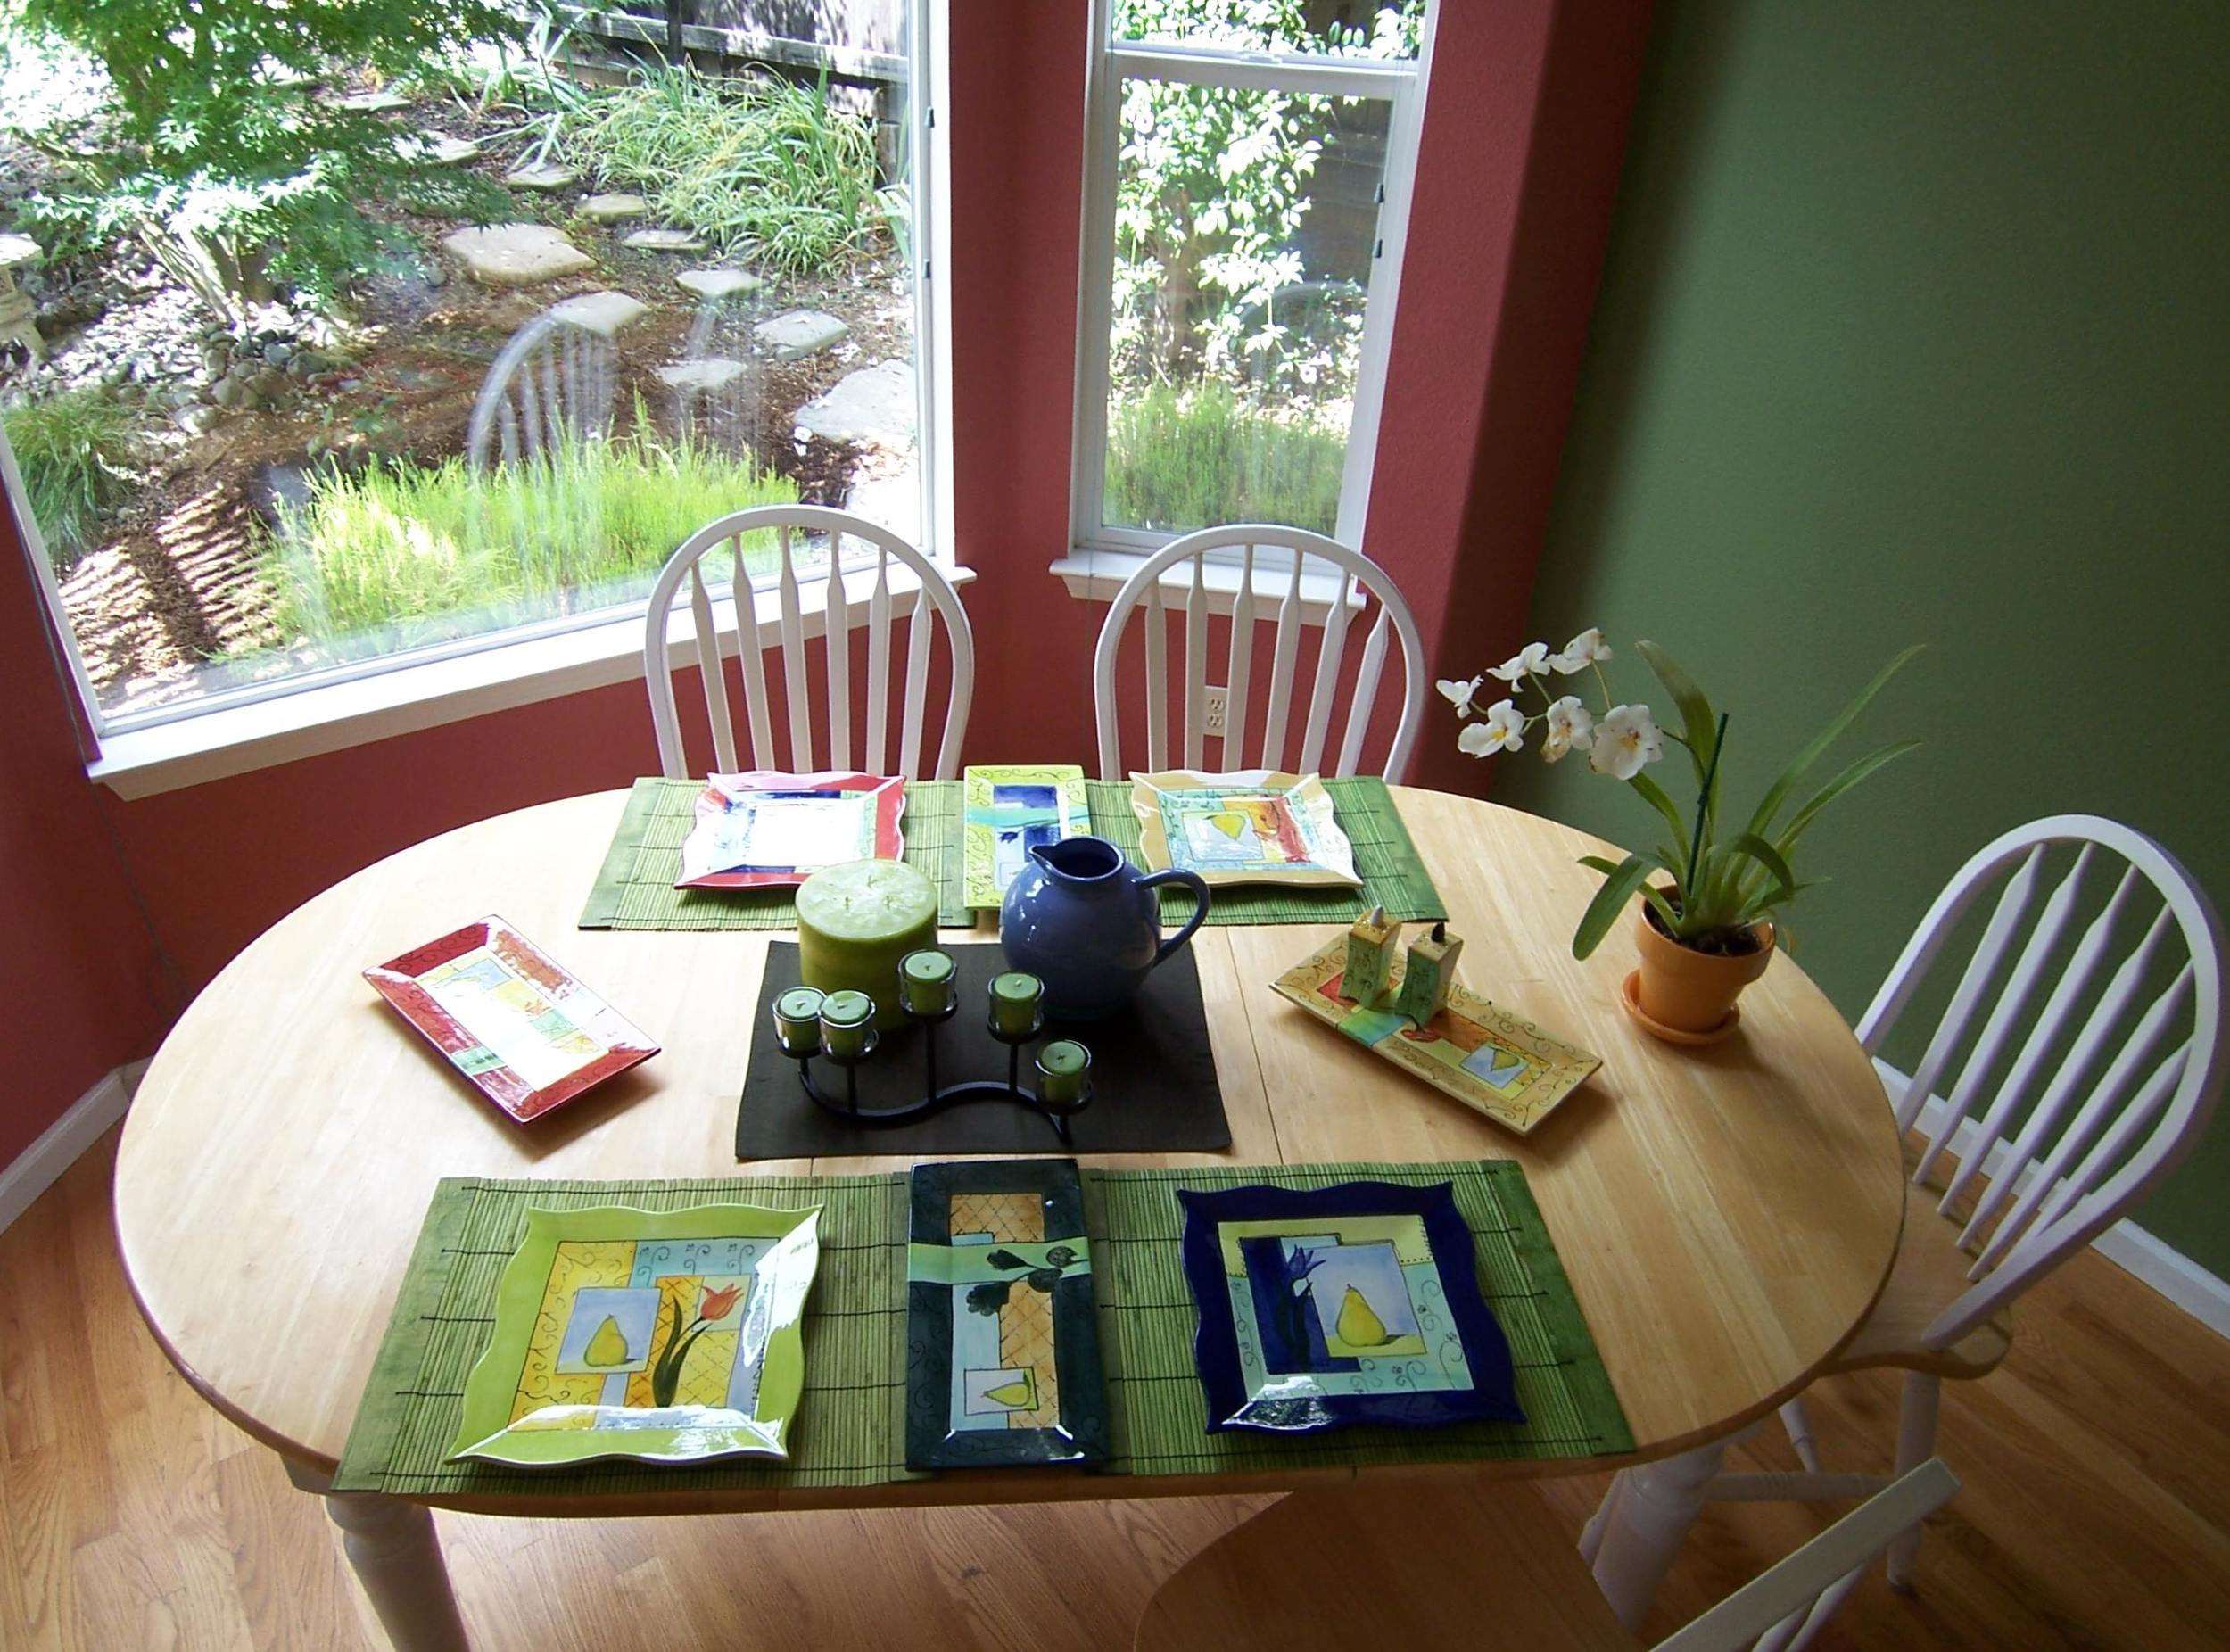 Kitchen+Decor+and+Paint+Color.jpg